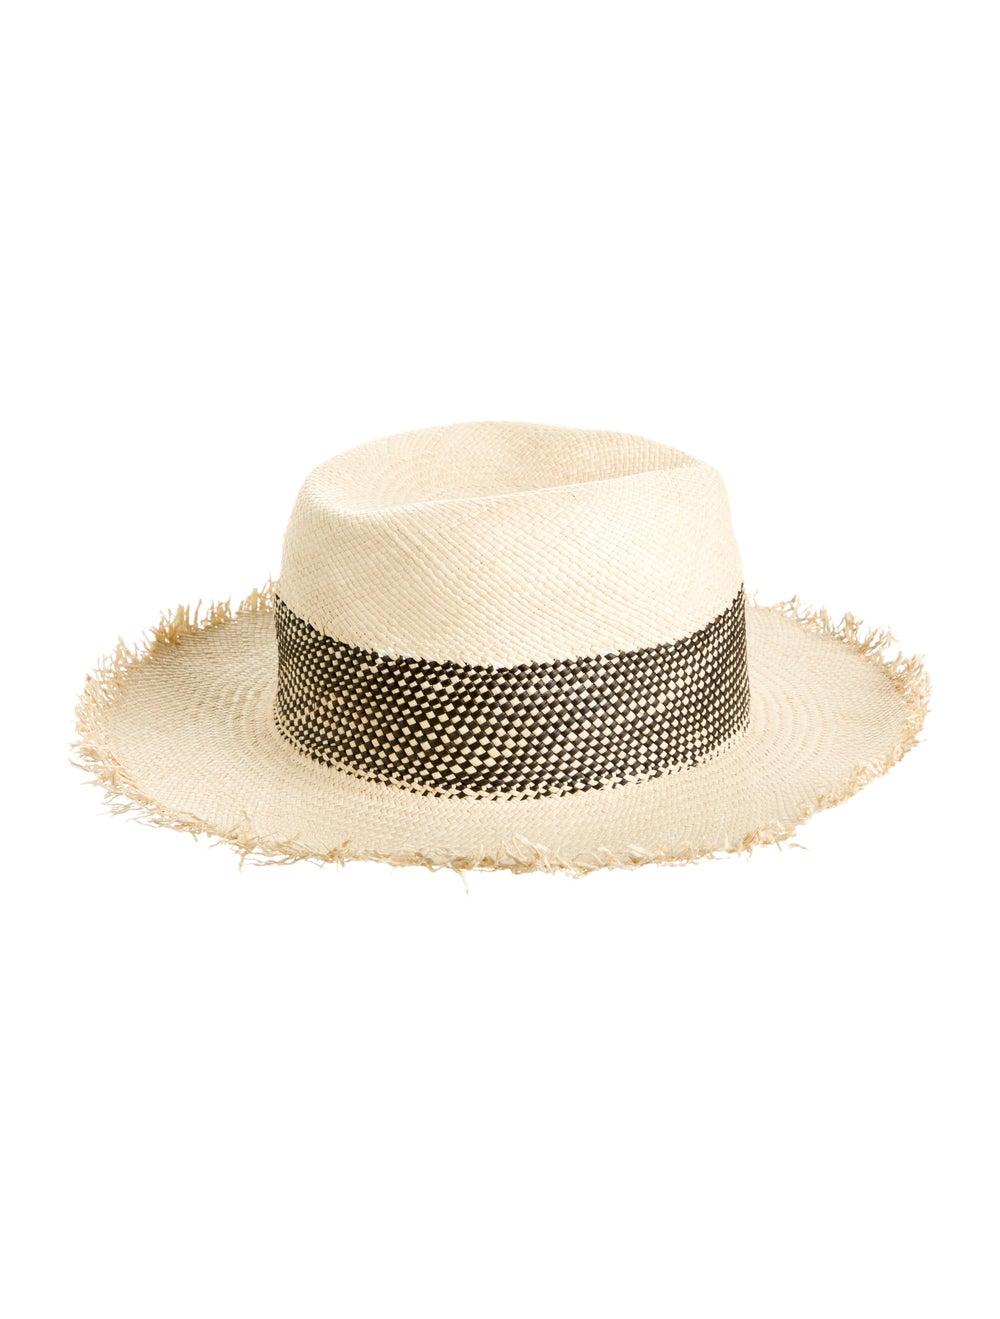 Rag & Bone Straw Wide Brim Hat - image 2